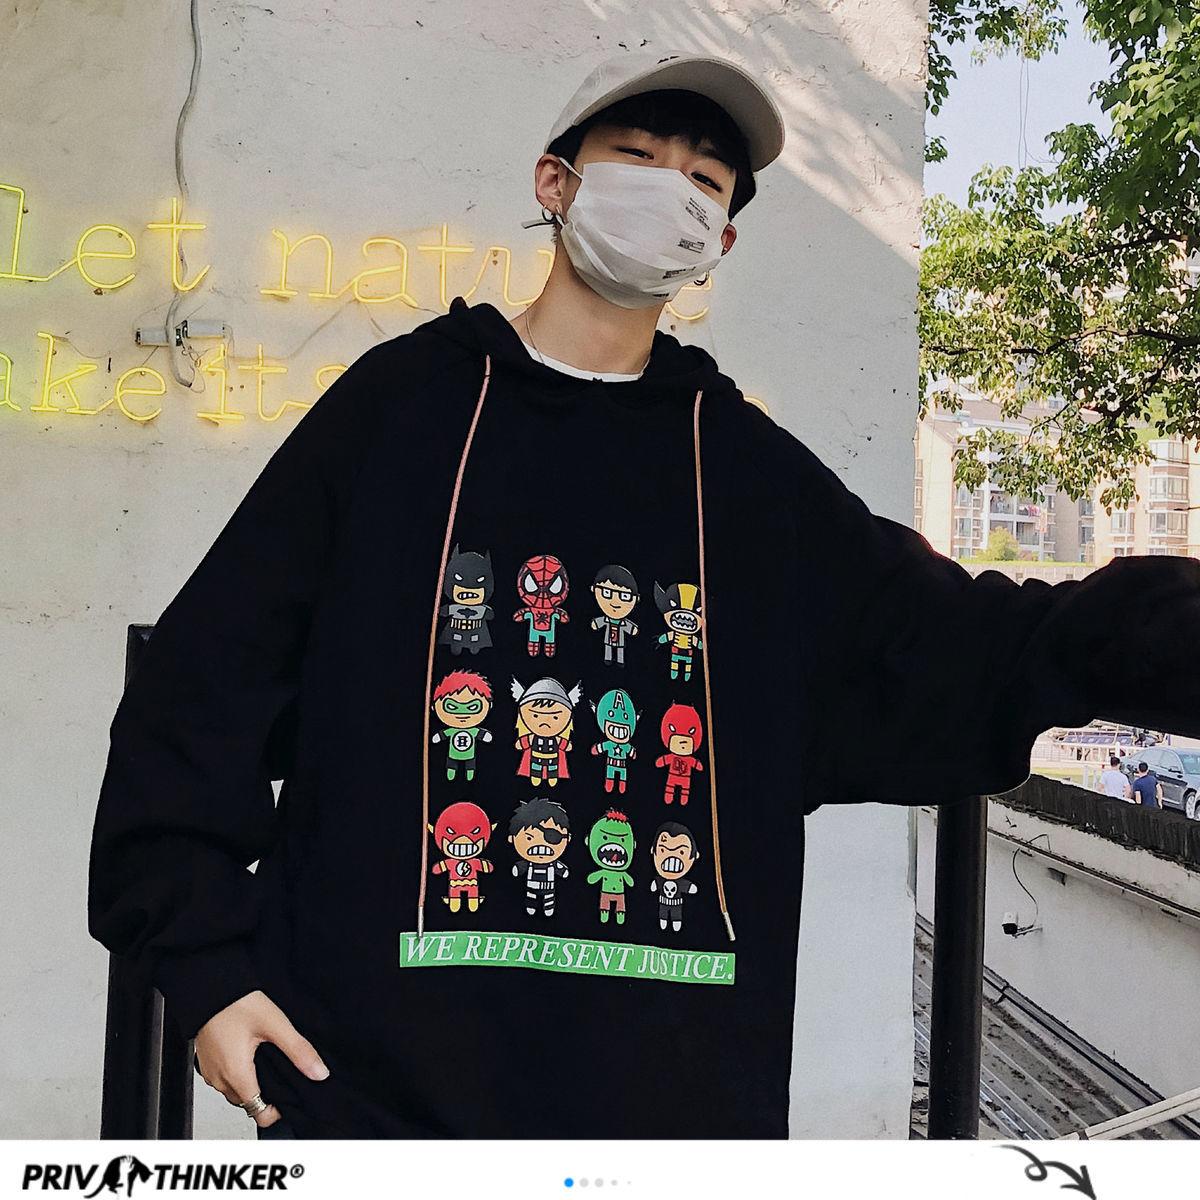 Privathinker 2020 Autumn Men's Casual Hoodies Graphic Printed Japanese Streetwear Men Fashion Hip Hop Pullovers Sweatshirts